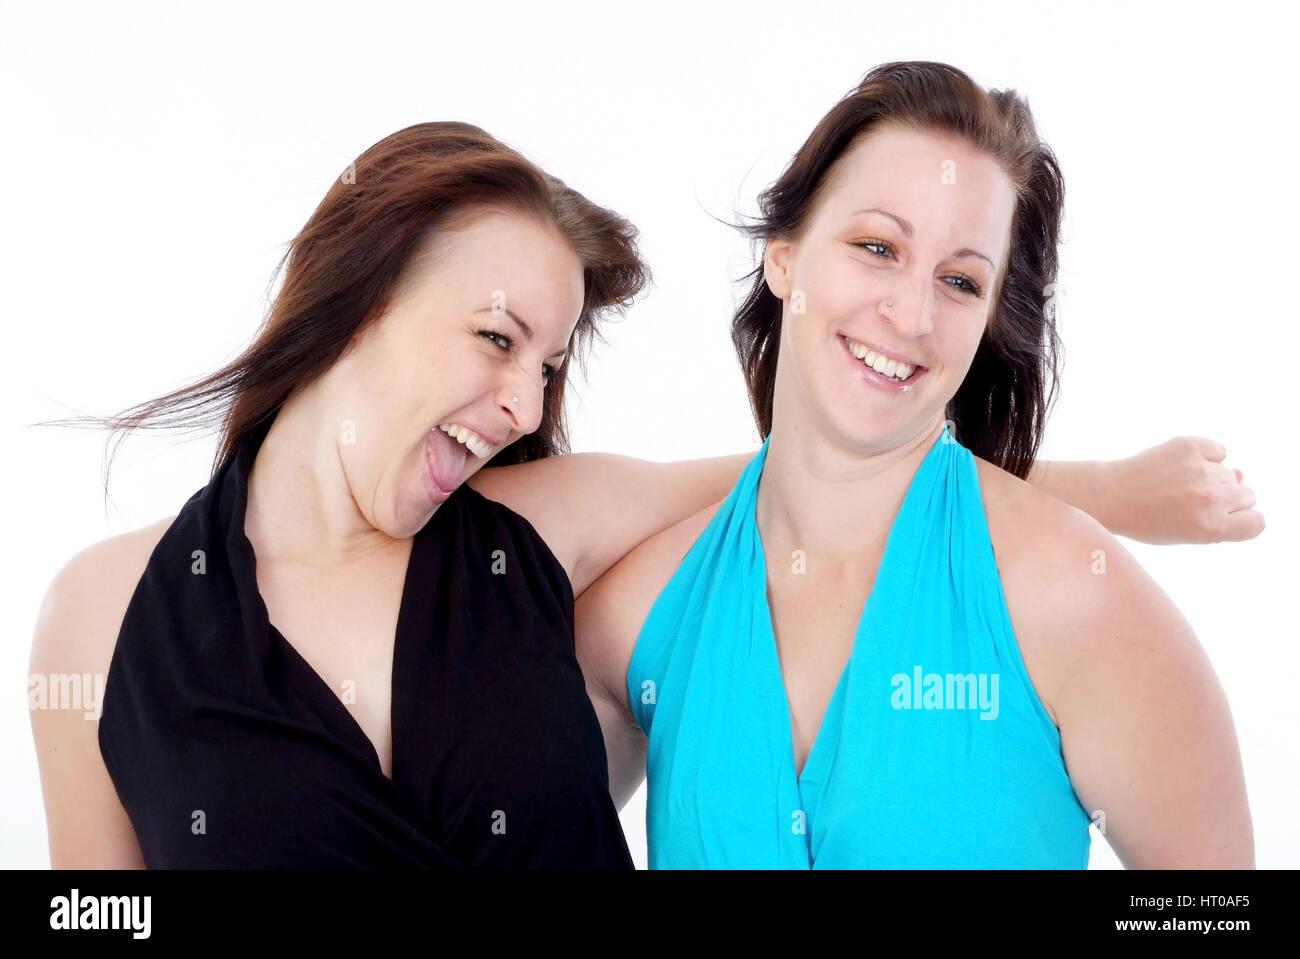 Zwillinge - twins - Stock Image